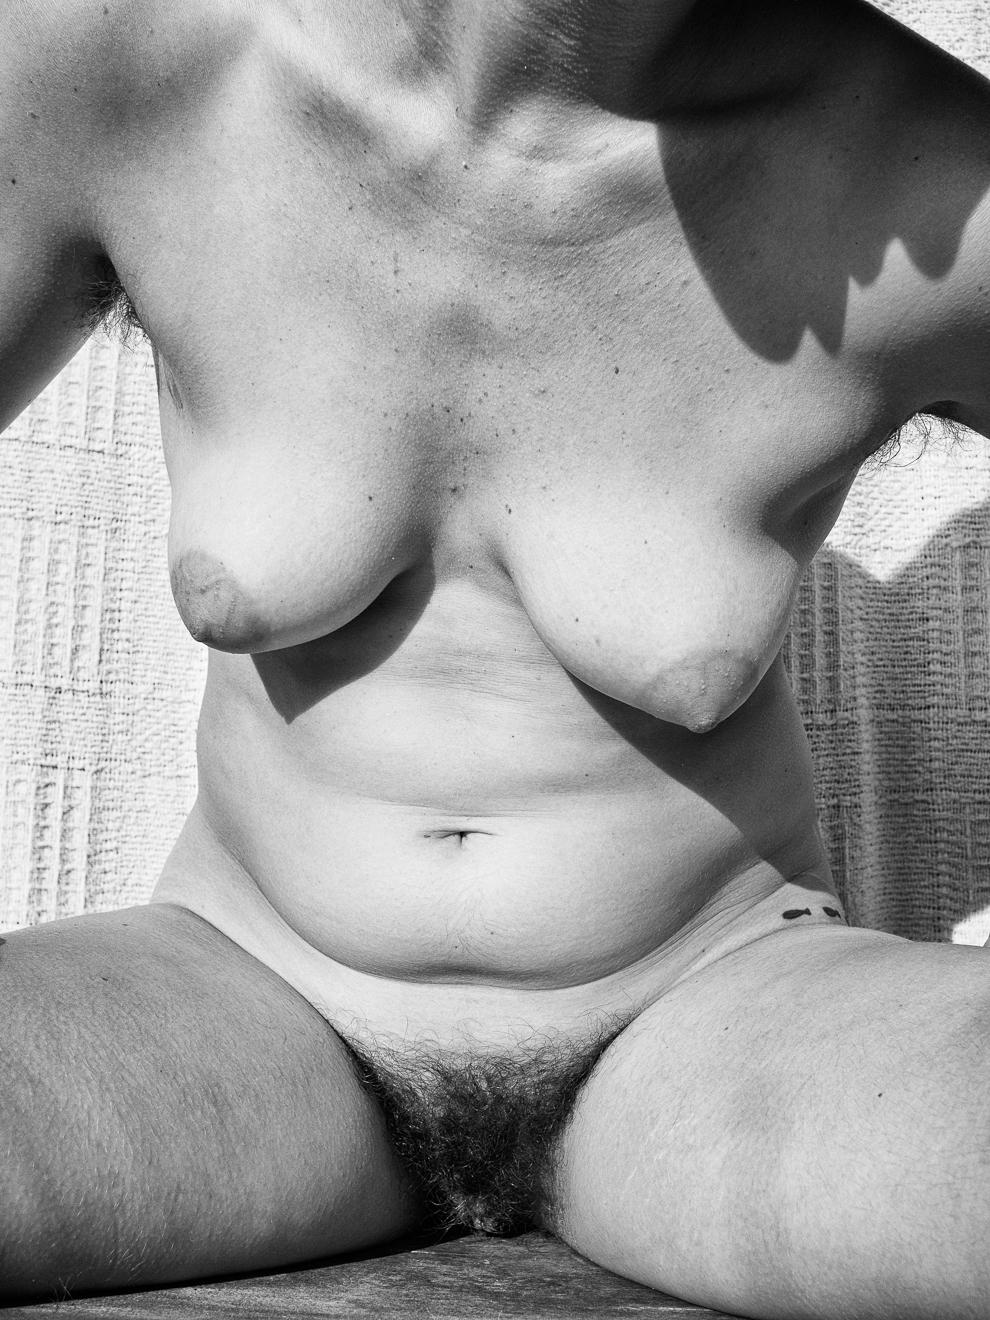 Audrey_B+W Body-14.jpg